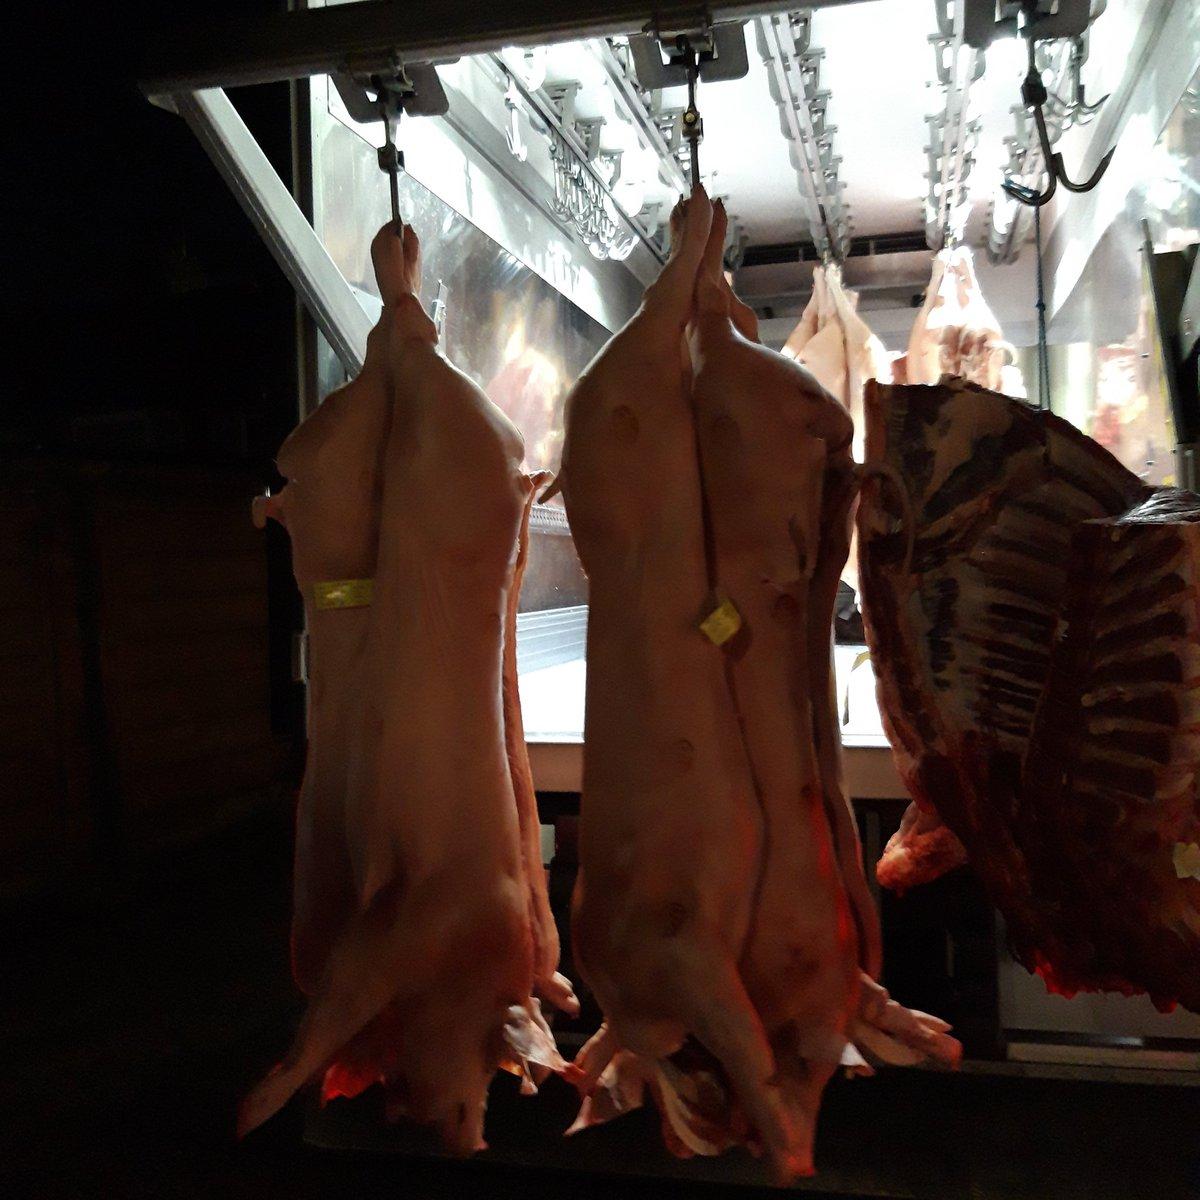 Reloading the fridge this morning #butcher #beef #pork #localmeat #localfarmer #meat #carnivorediet #Otley #Ilkley #Wetherby #Rawdon #Knaresborough #Bramhope #Yorkshire #Leeds #Bradford #Menston #Pool #Guiseley #Yeadon #Adel #Addingham https://t.co/CHXAZ2zVYq